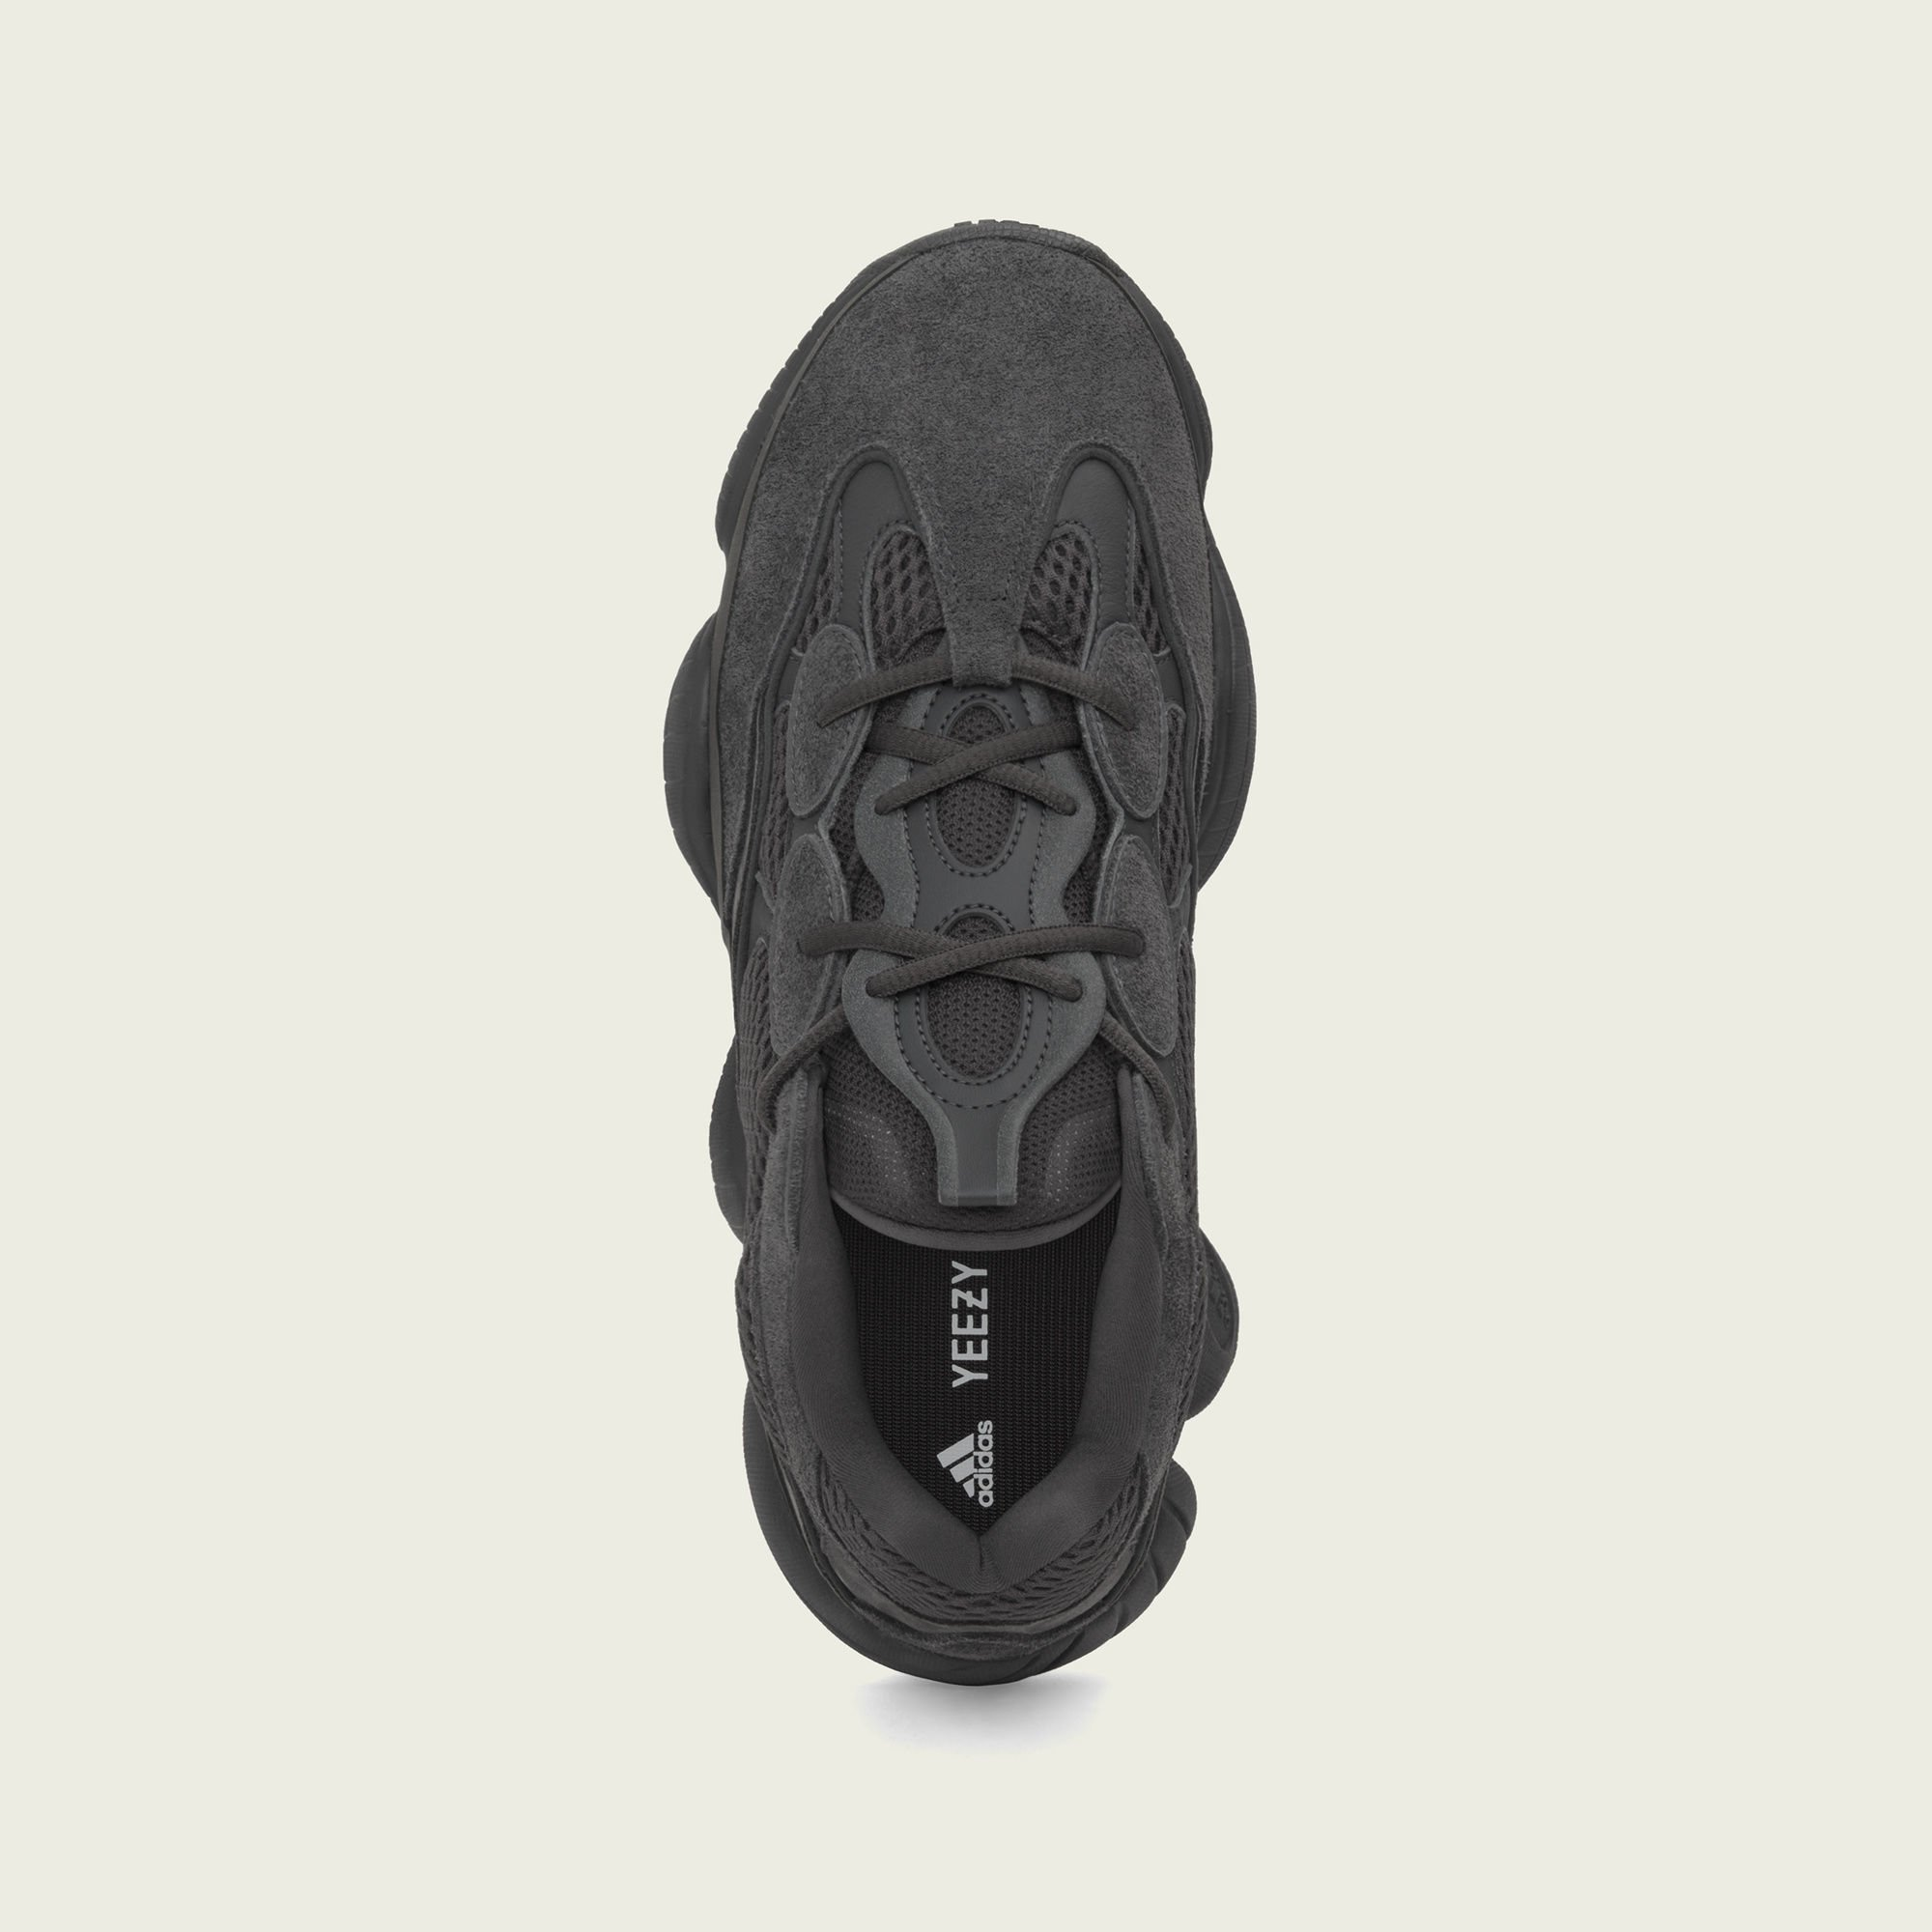 Adidas Yeezy 500 F36640